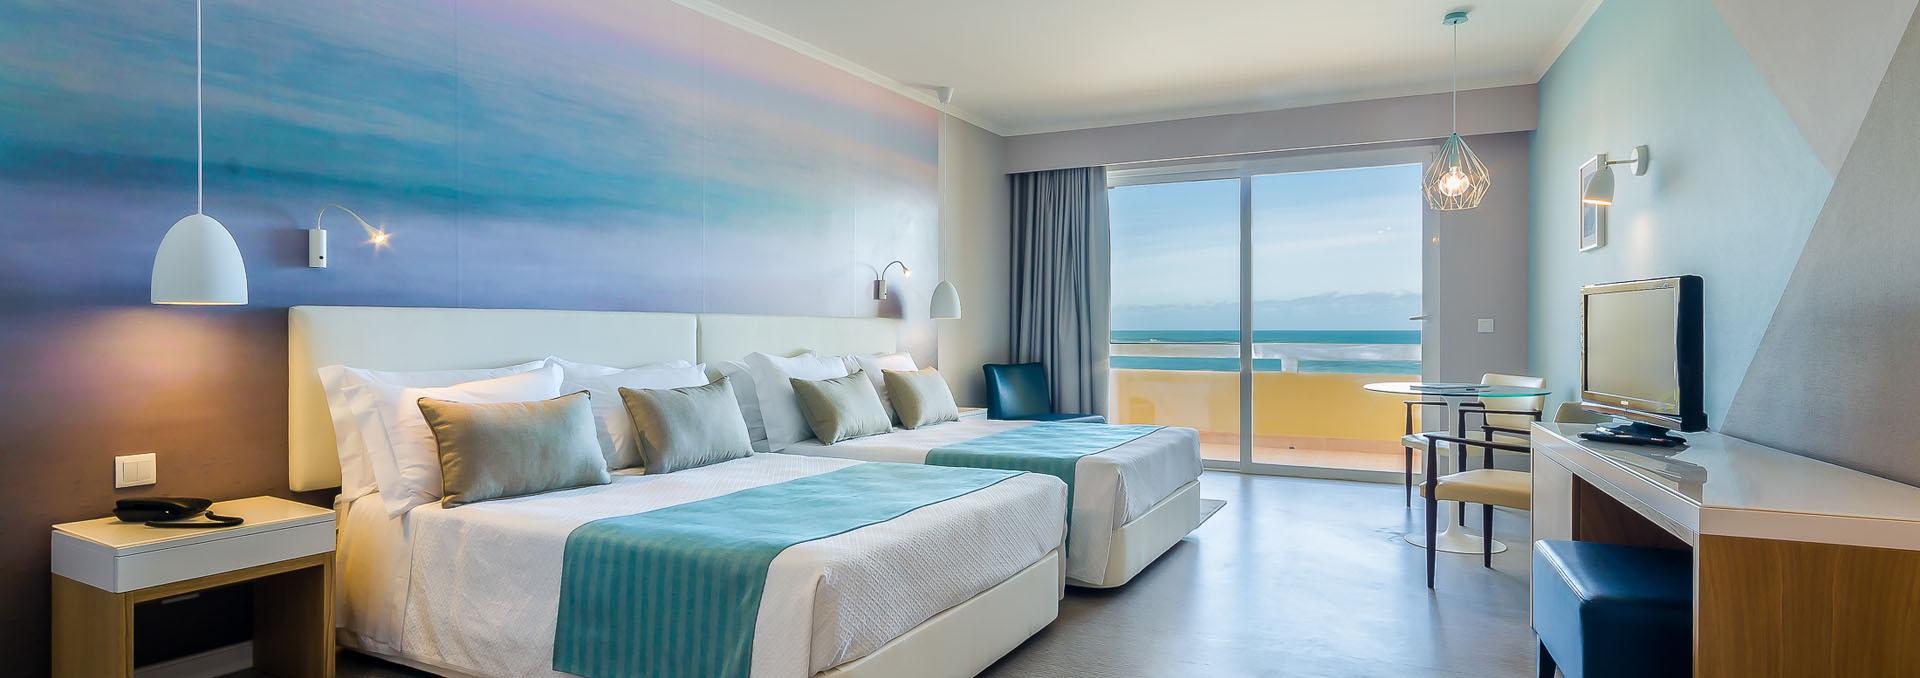 Arribas Sintra Hotel Alojamento / Executive Superior